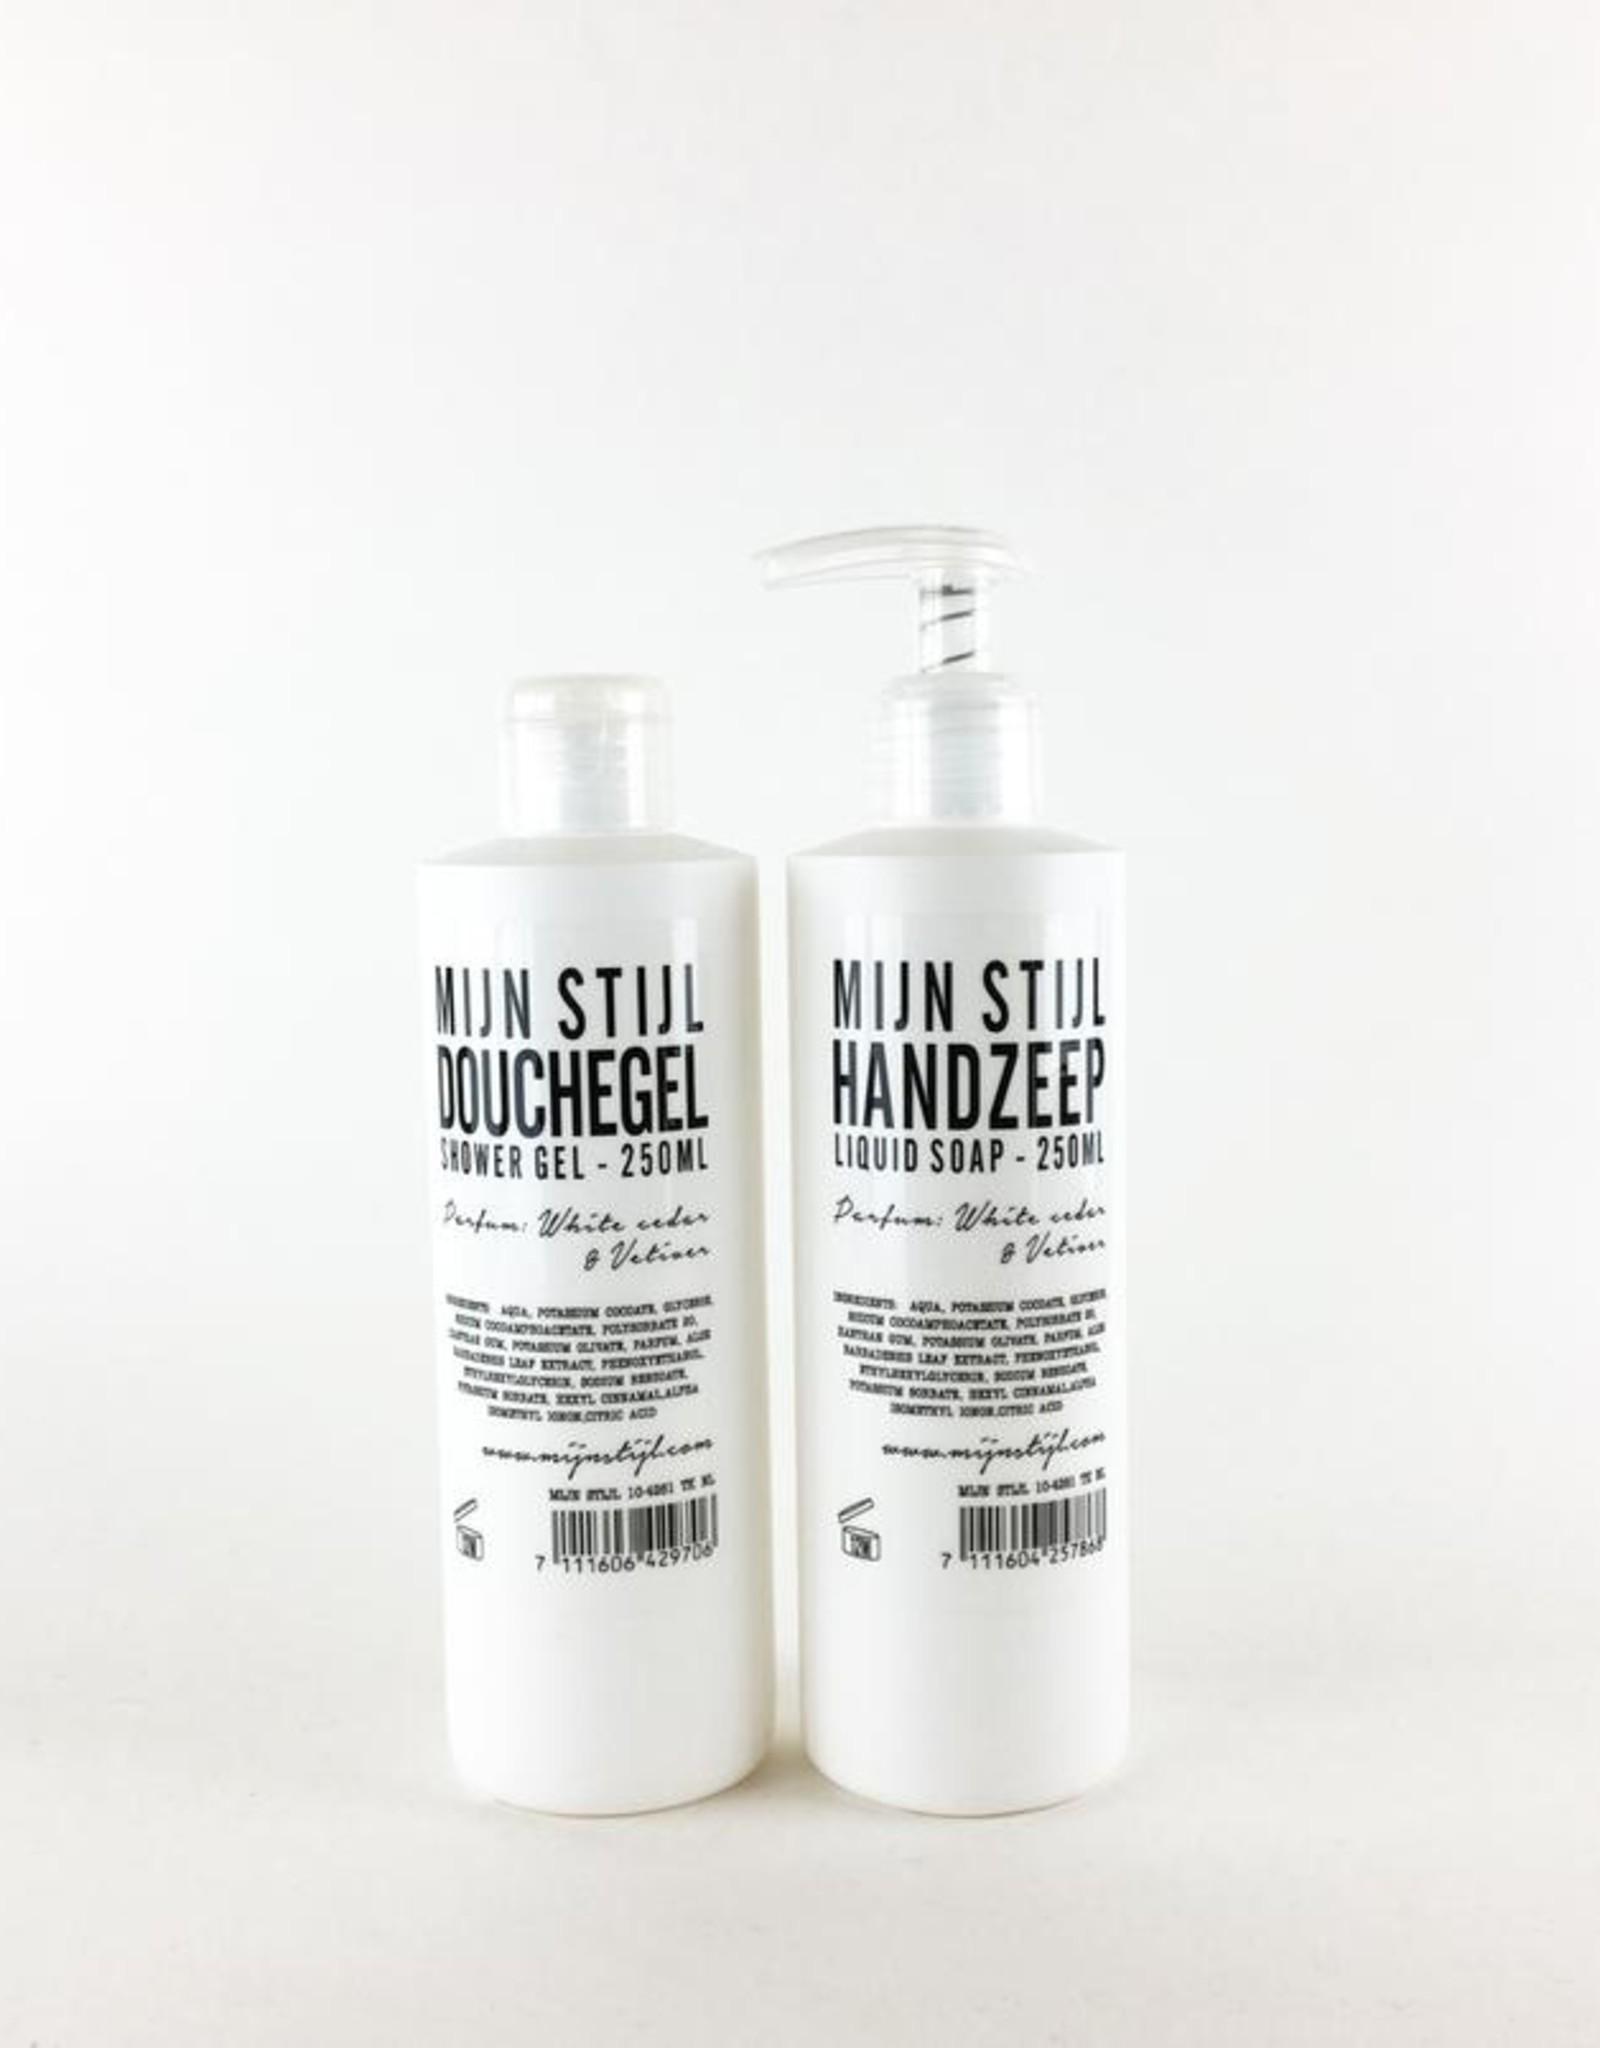 Mijn stijl Douchegel parfum White Cedar en Vetiver 250ml